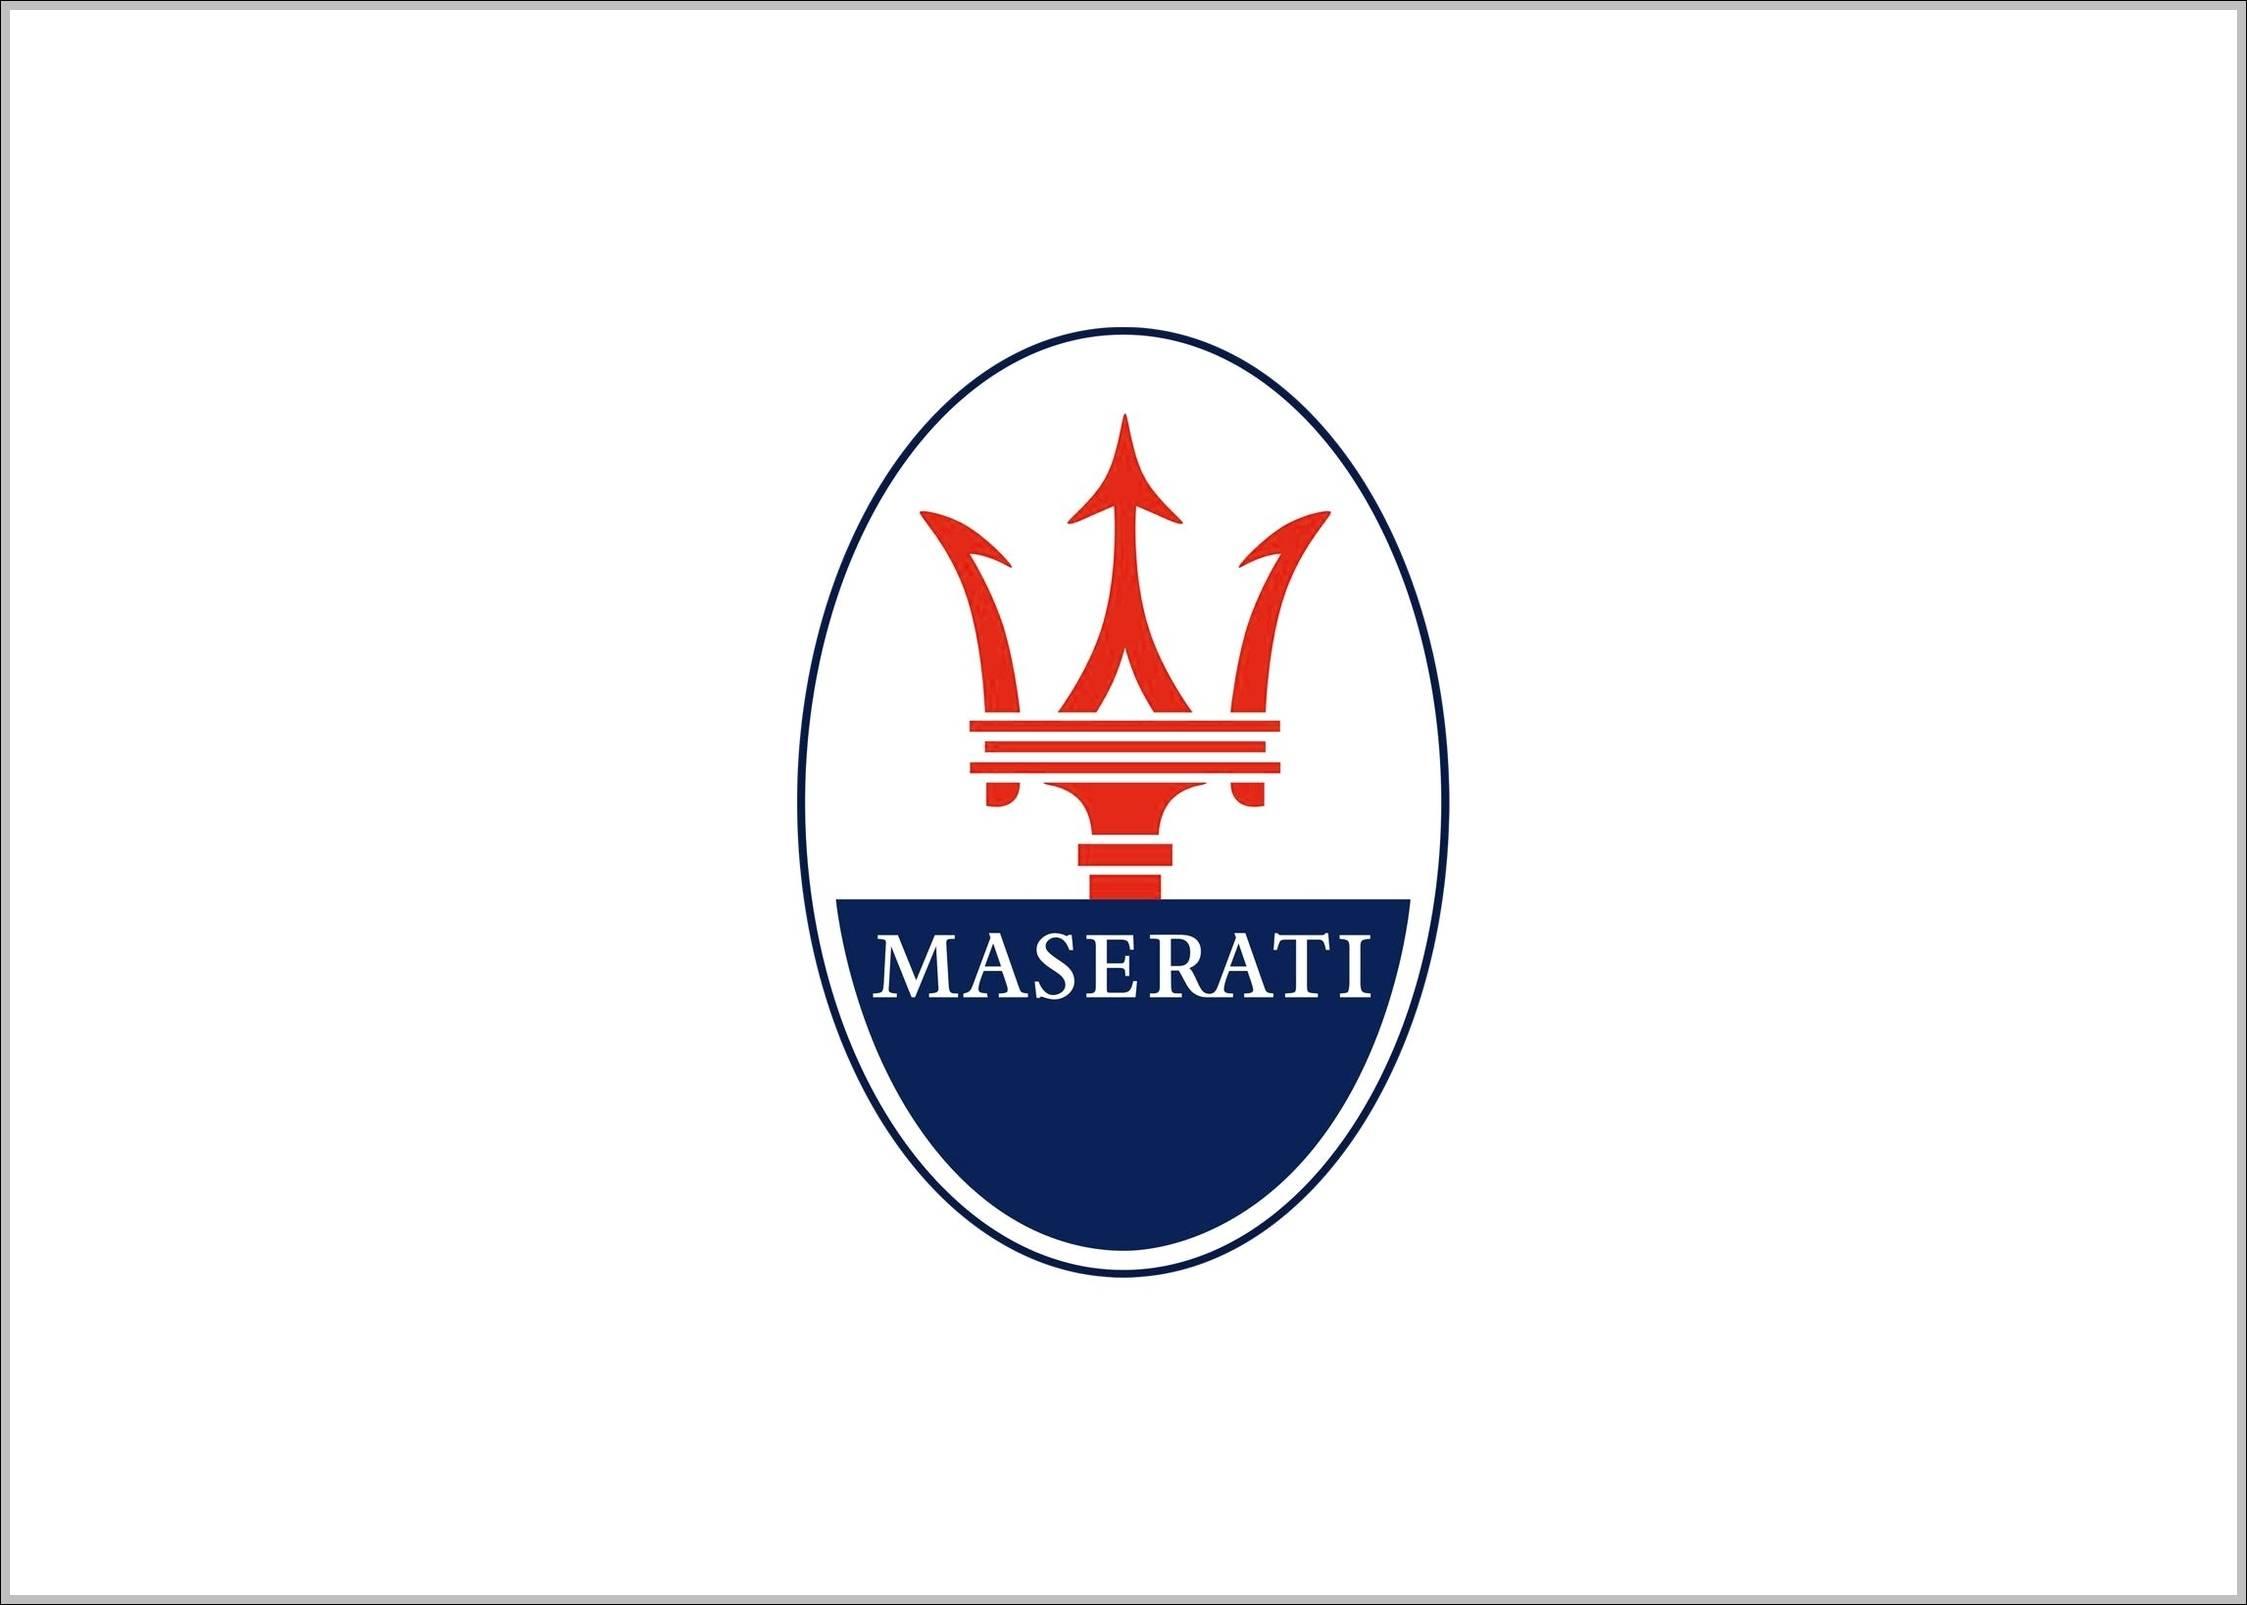 maserati logo oval logo sign logos signs symbols trademarks